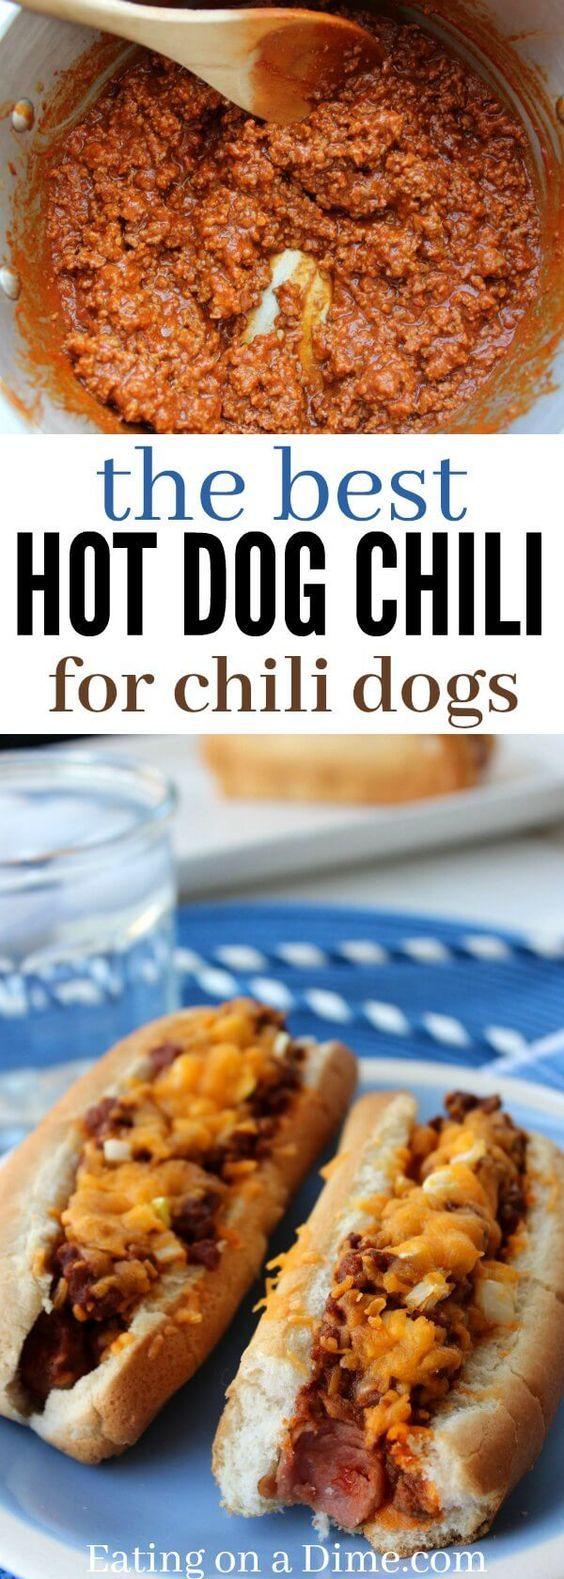 The Best Hot Dog Chili